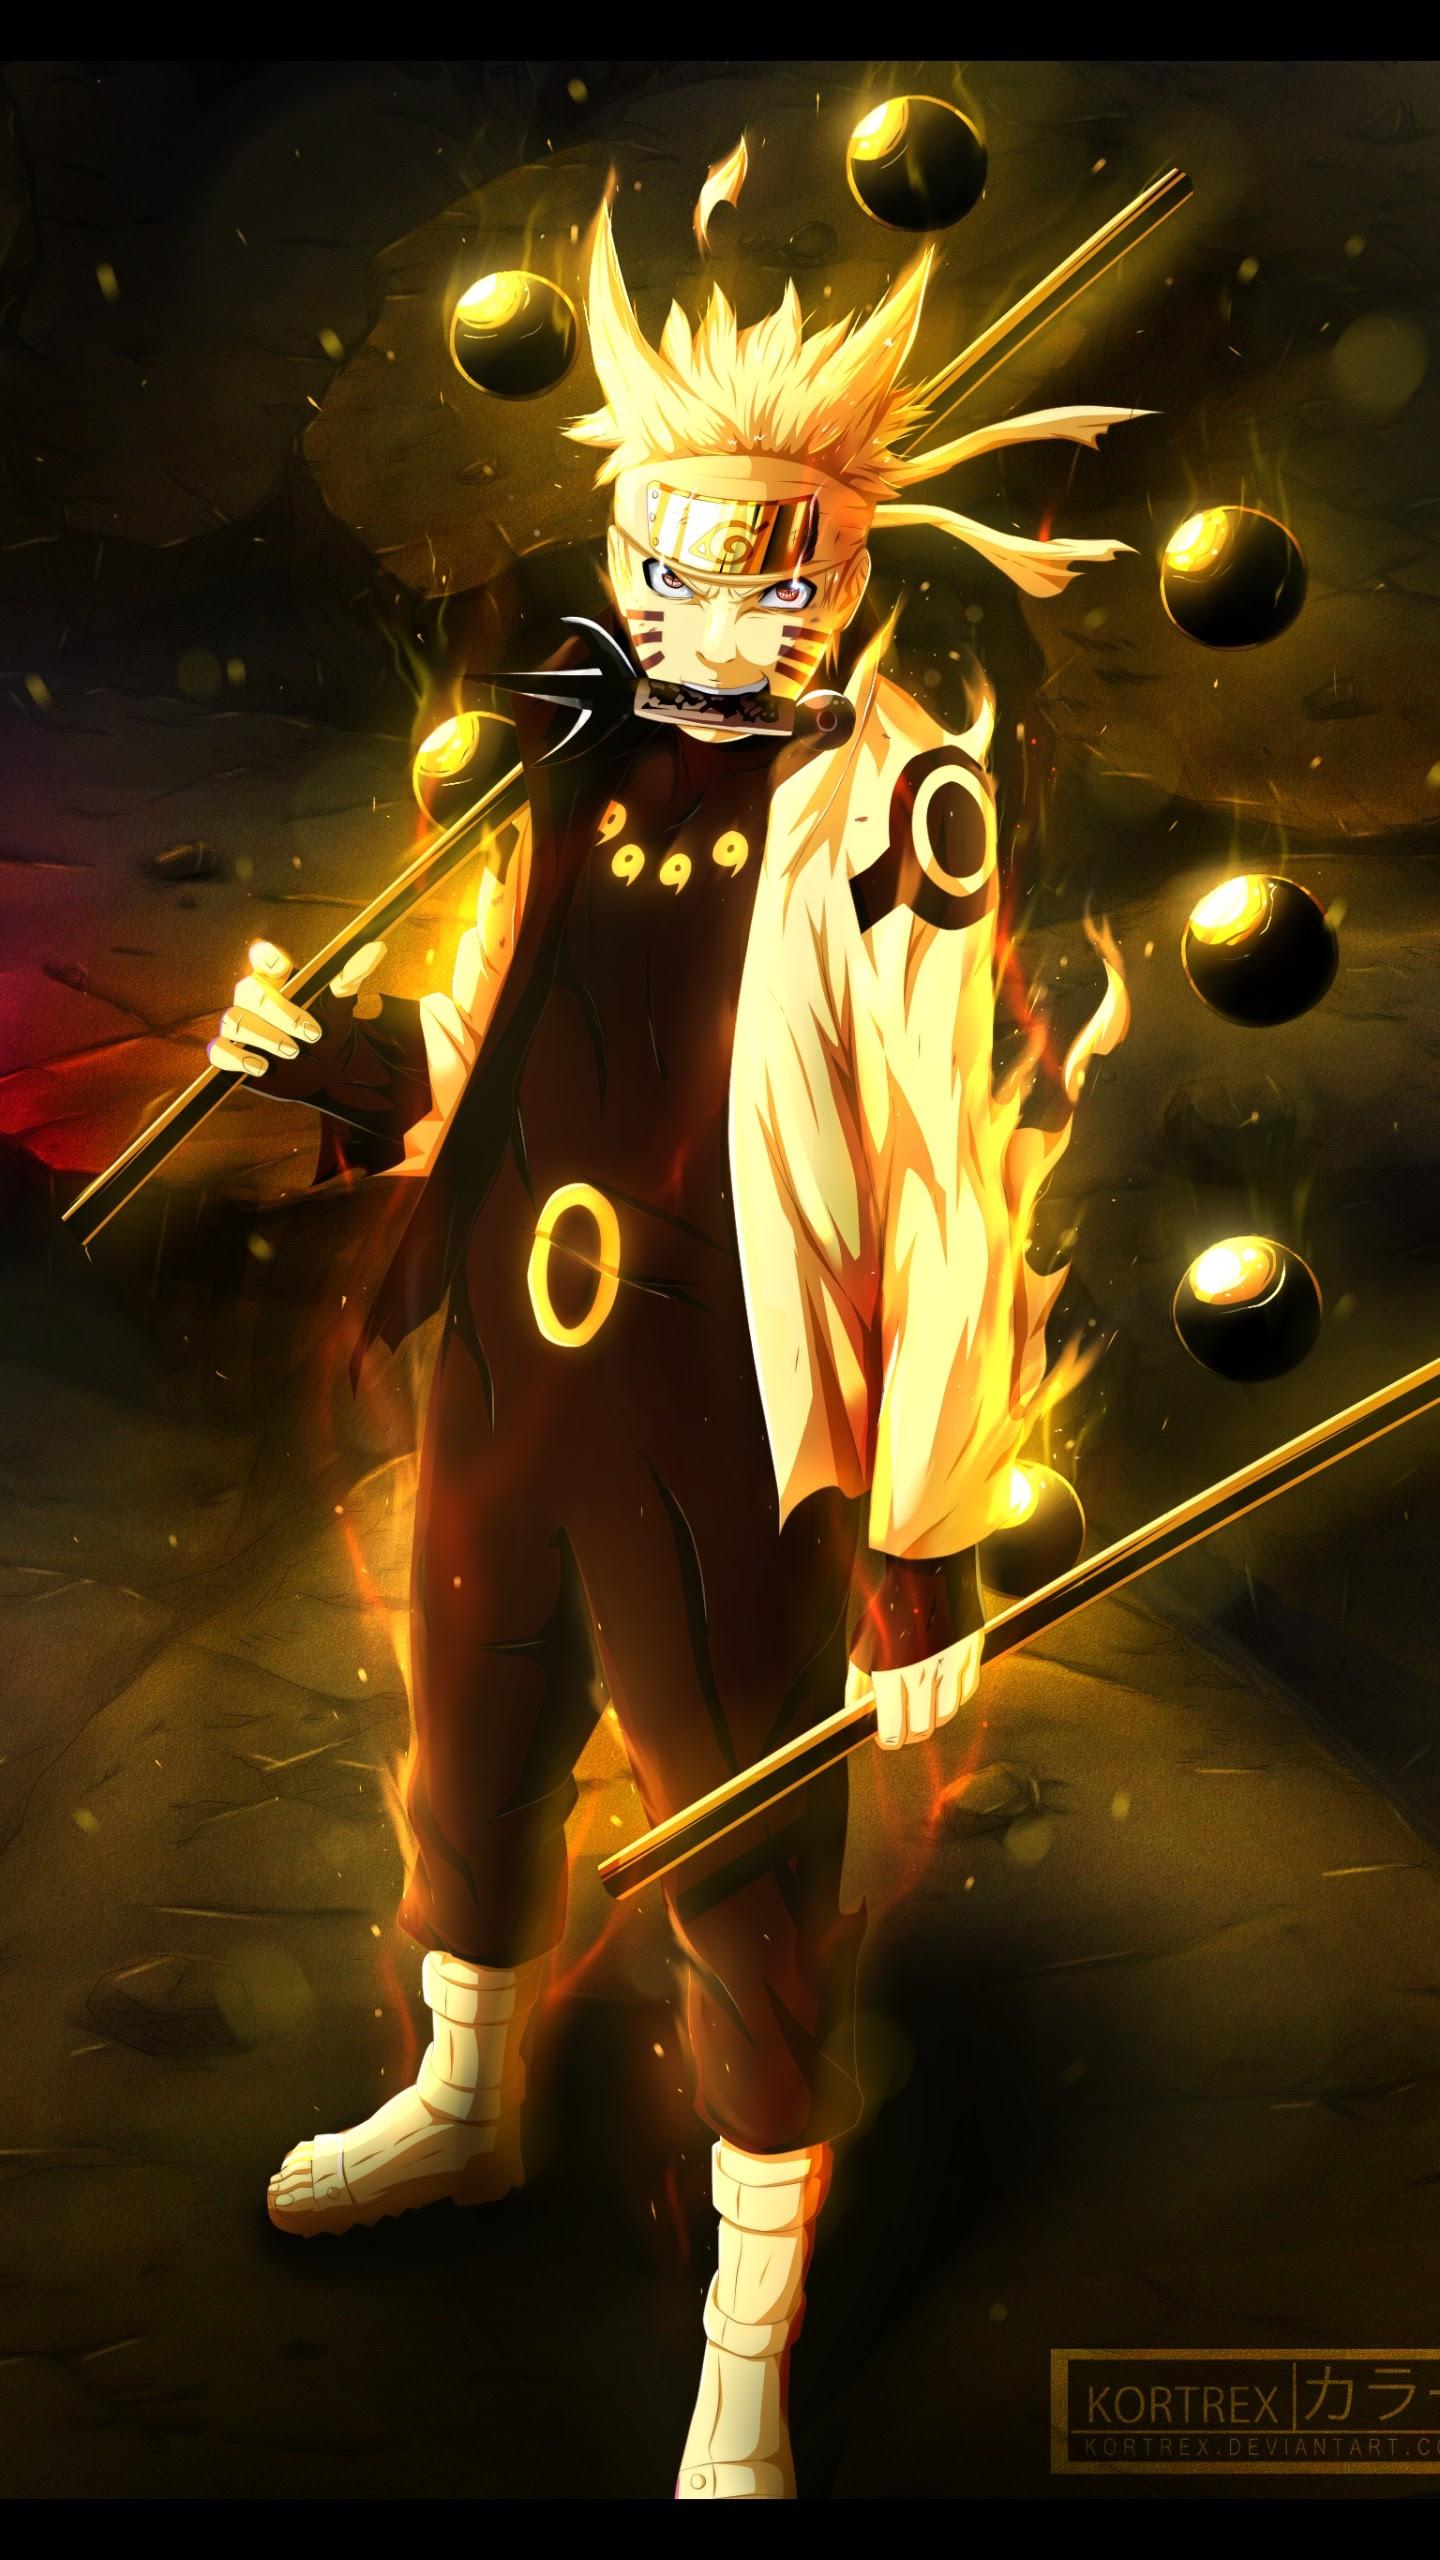 Wallpaper Anime 3d Naruto gambar ke 11